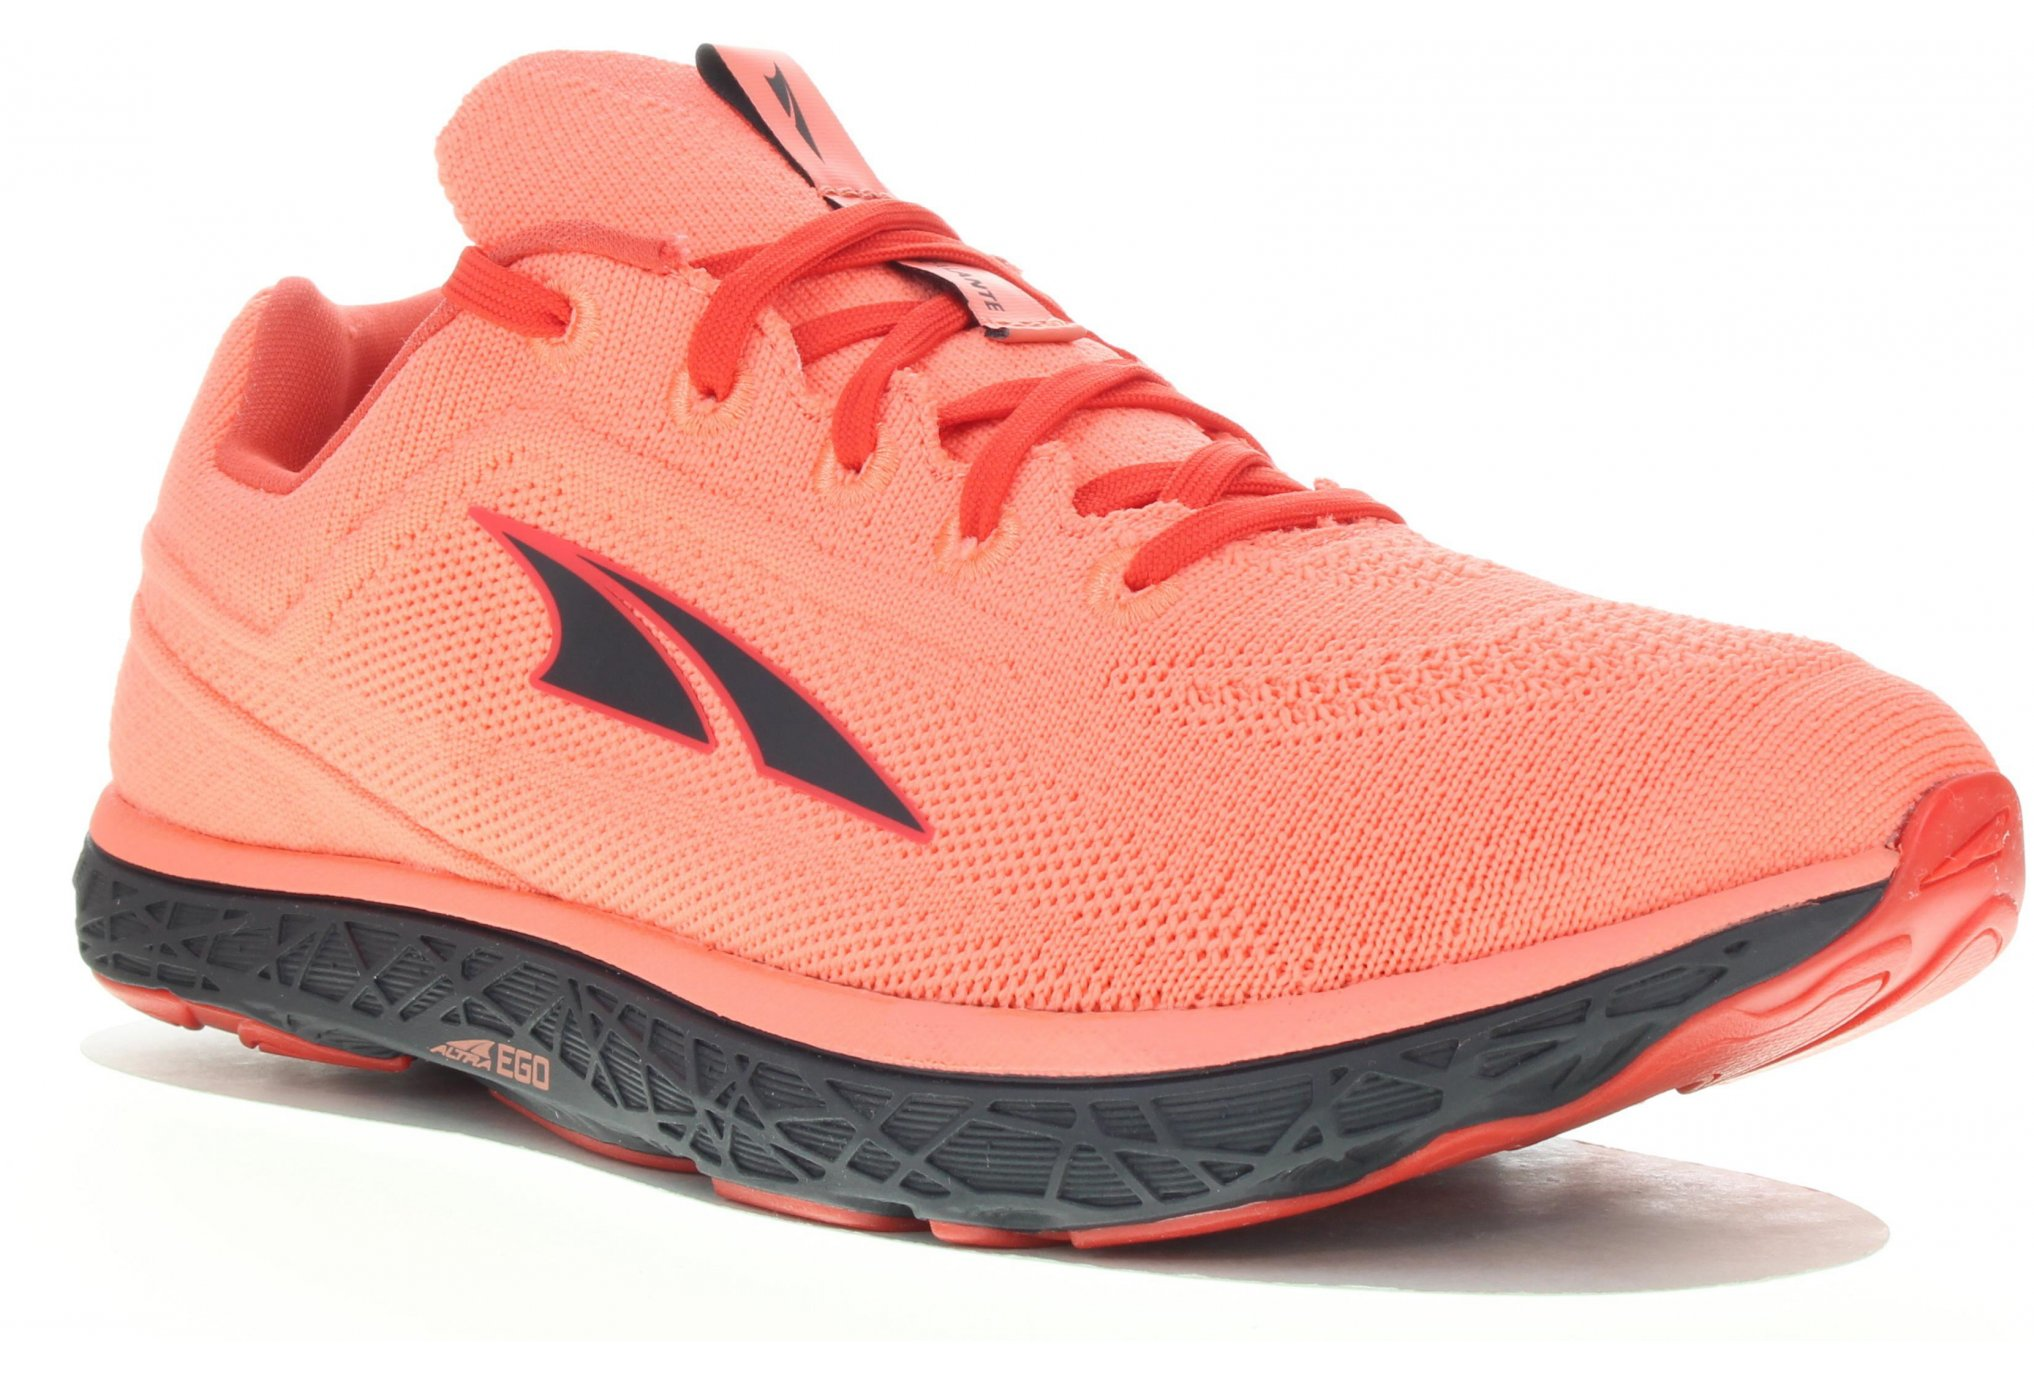 Altra Escalante 2.5 Chaussures running femme